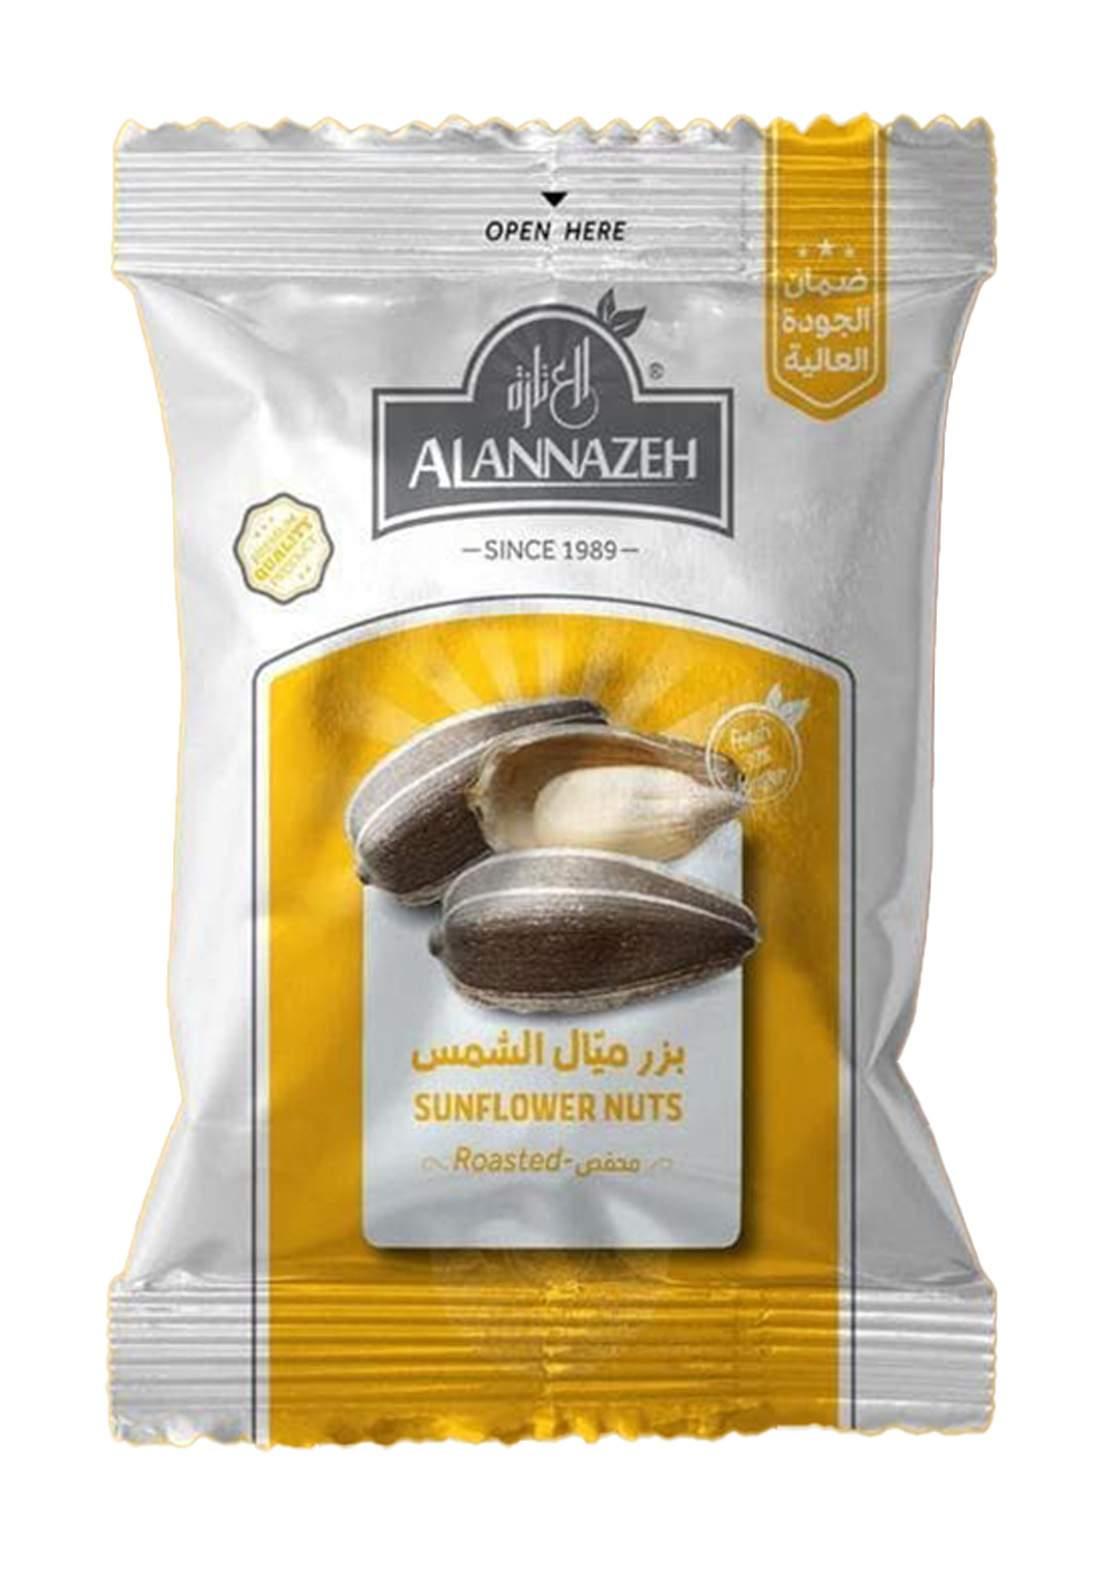 Al-Annazeh Mayal Shams Seeds Nuts 90g بزر ميال الشمس